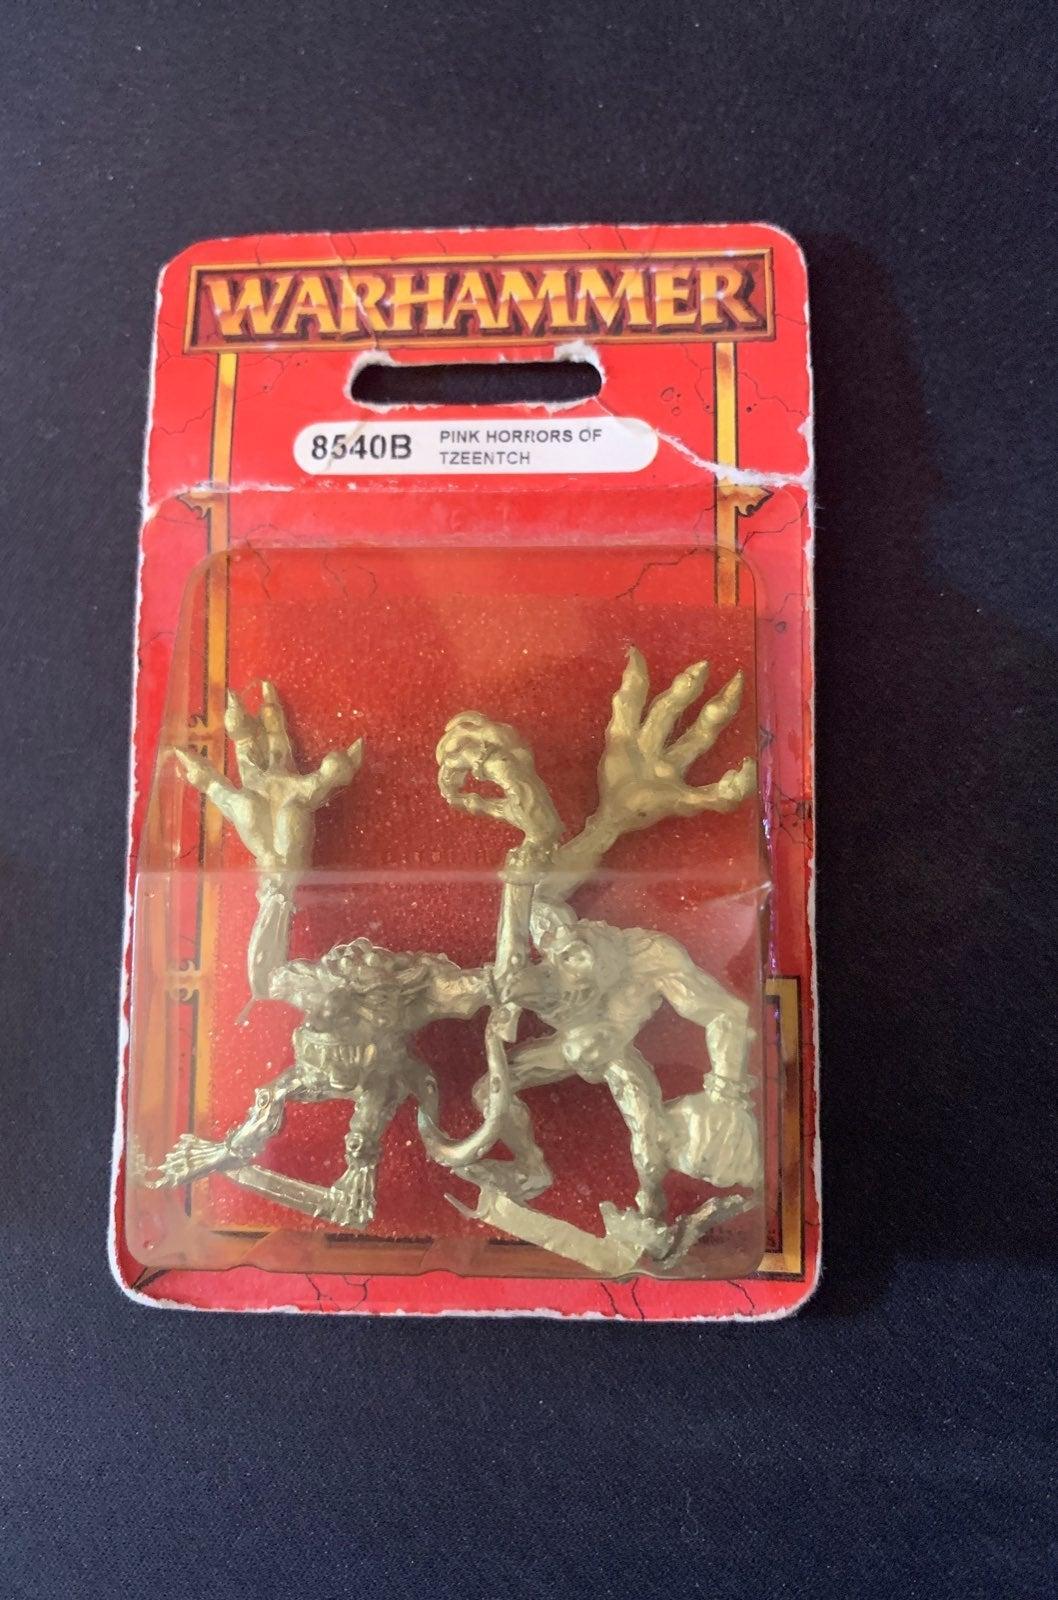 Warhammer fantasy Pink horrors